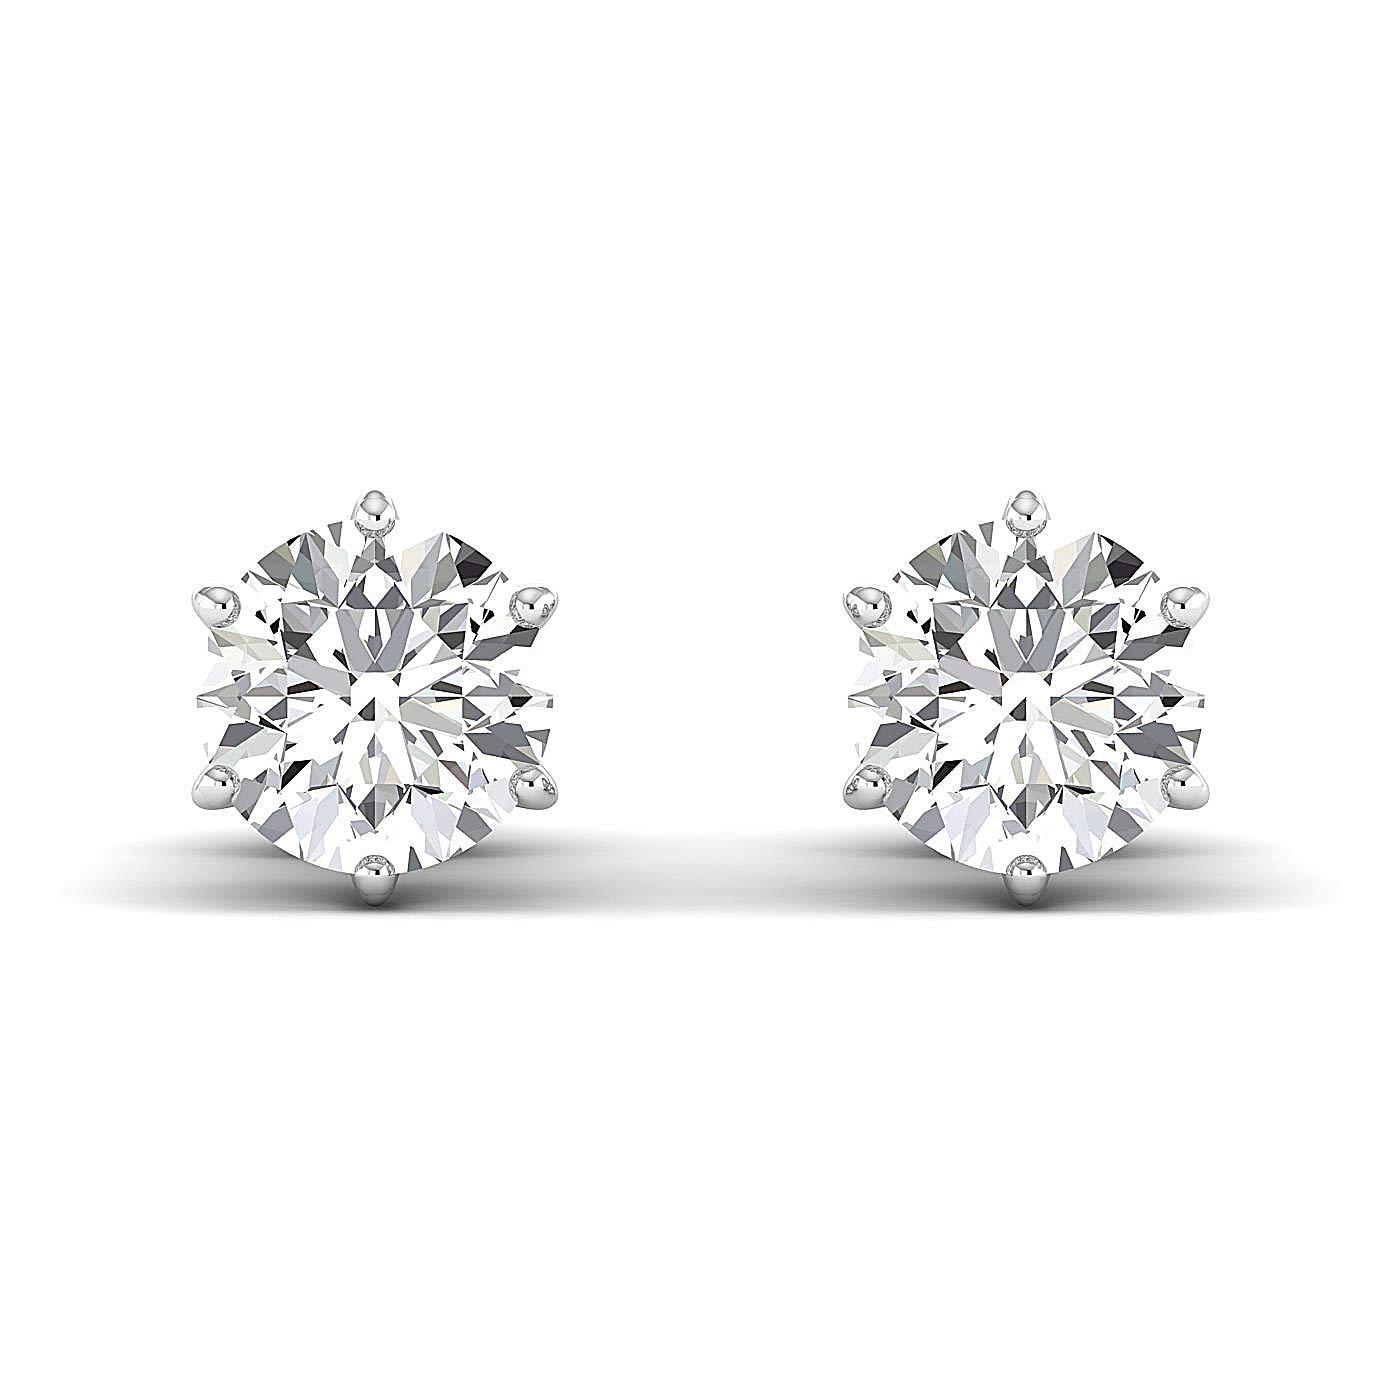 Round Brilliant 18K white-gold GH//VVS Stud Earrings for Women perfect Jewelry Gifts for Women Teen Girls Earring Studs 0.3 to 4 Carat Moissanite Stud Earrings